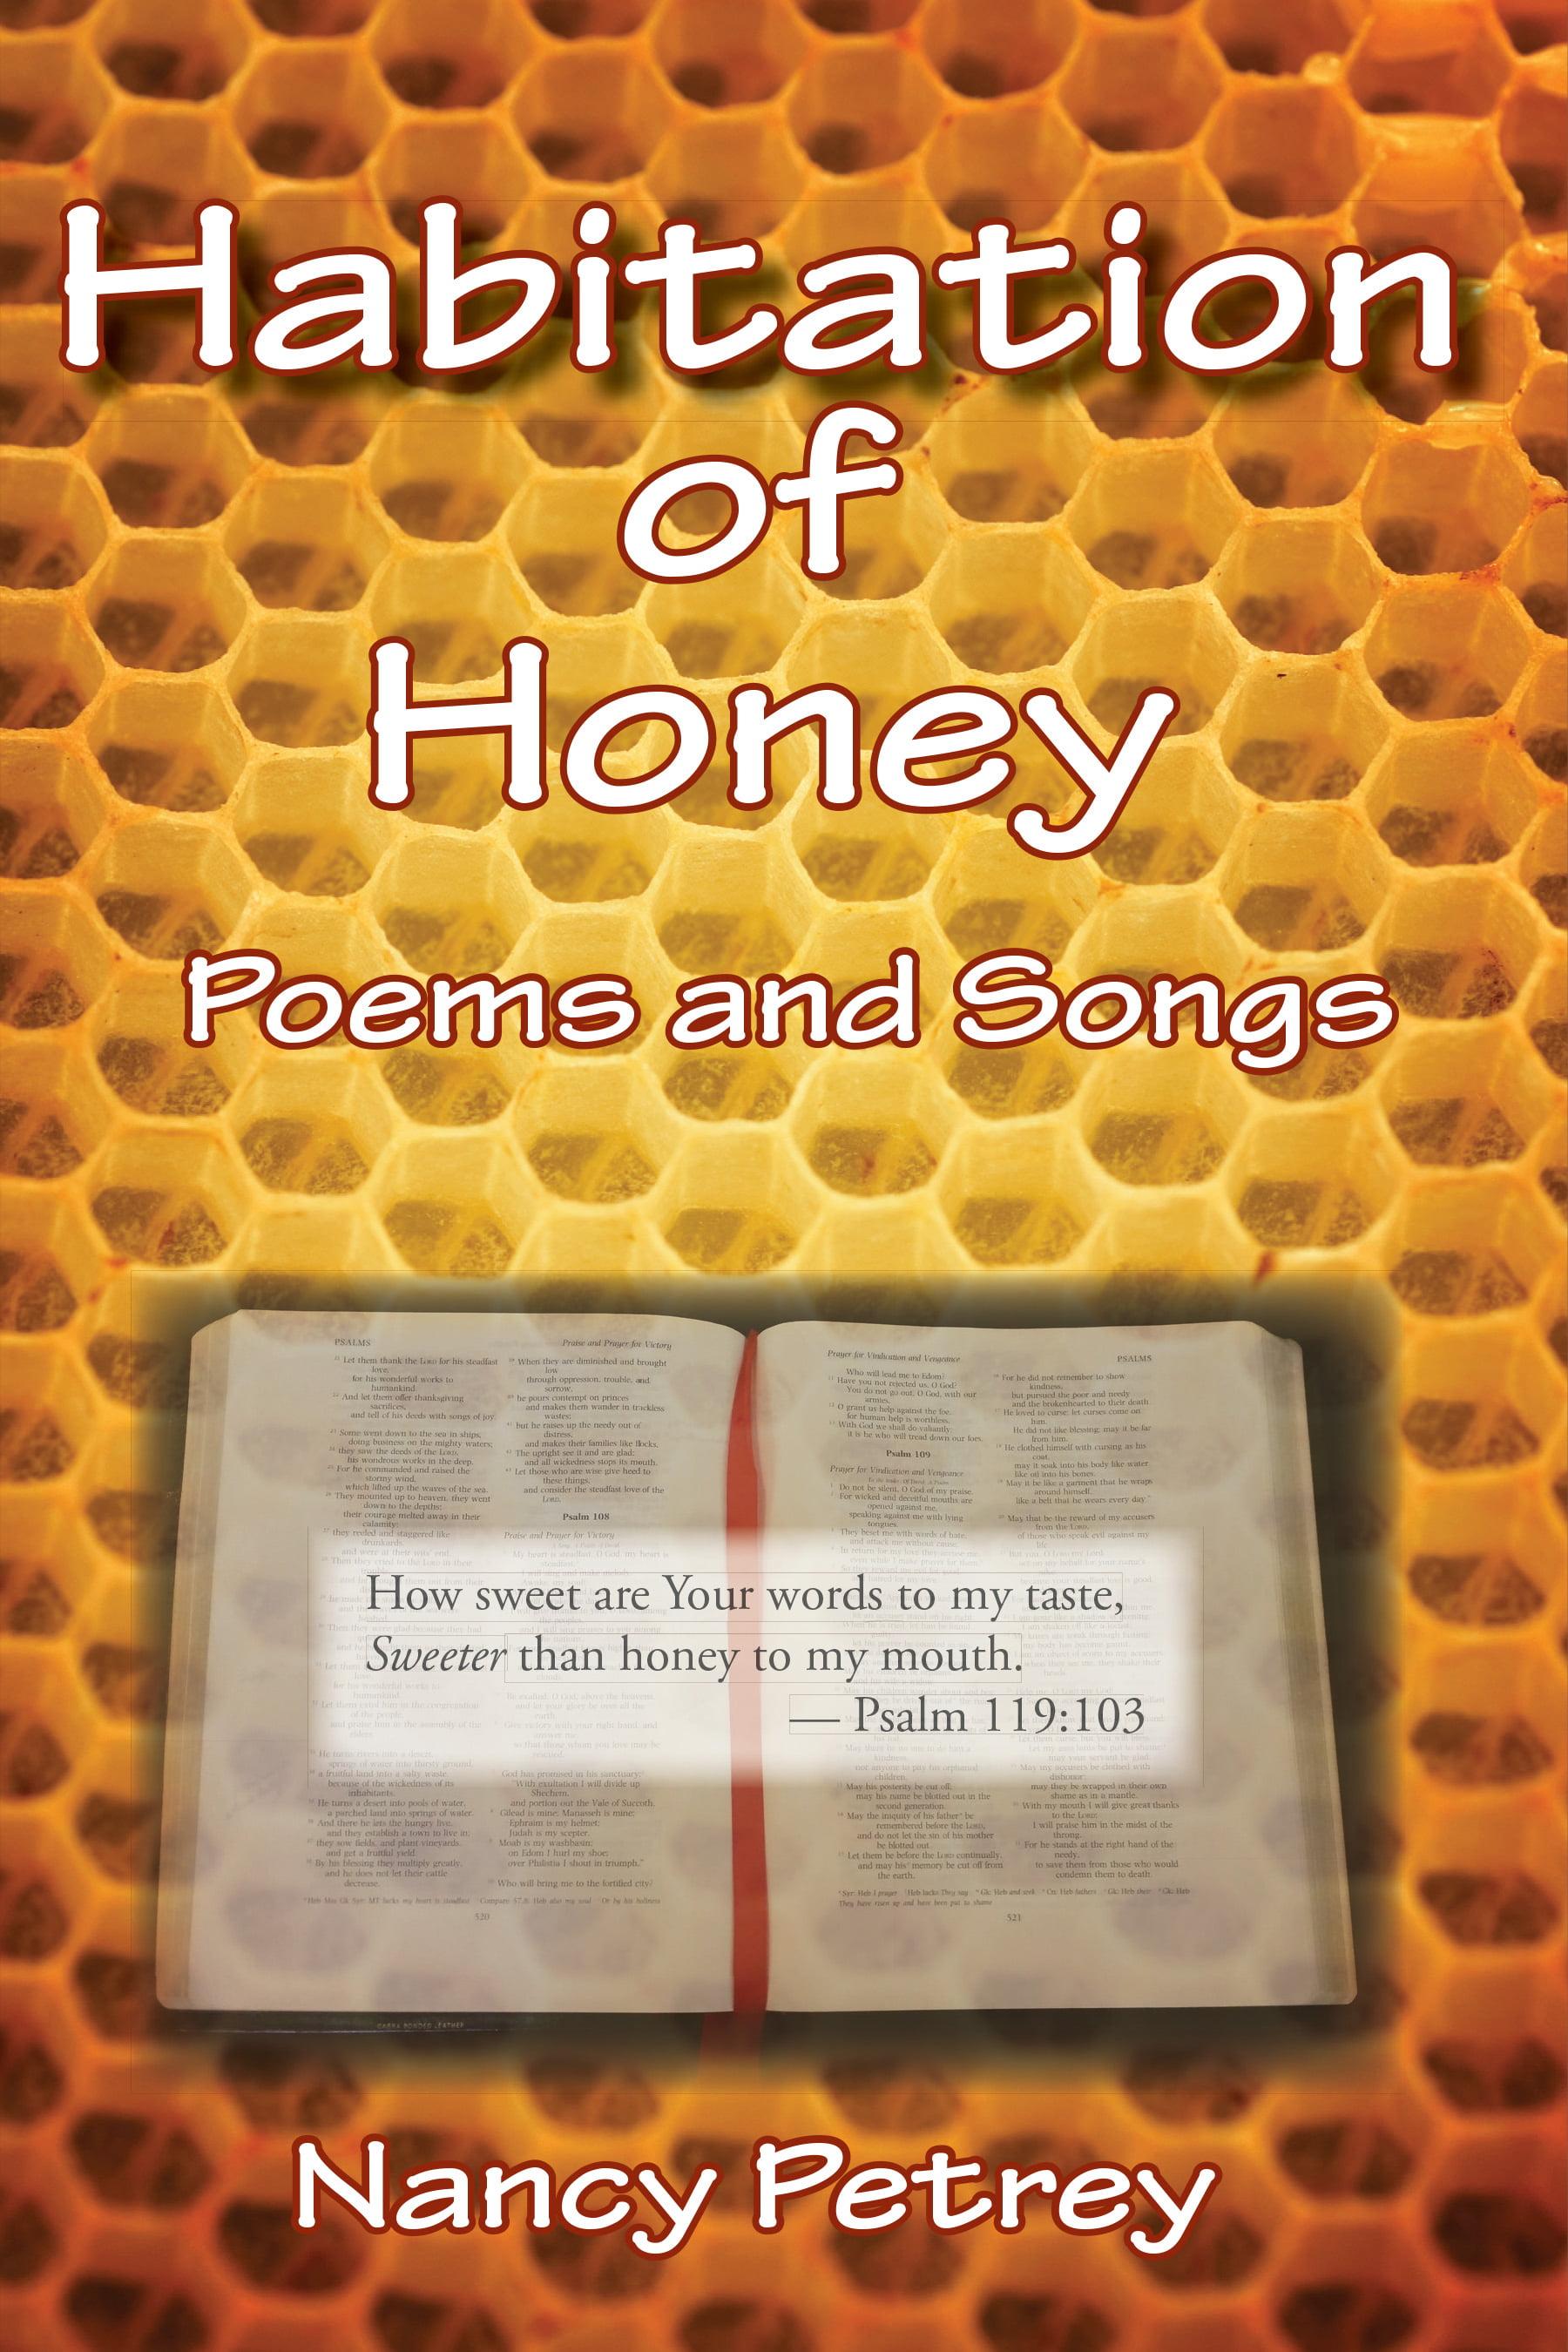 Habitation of Honey by Nancy Petrey